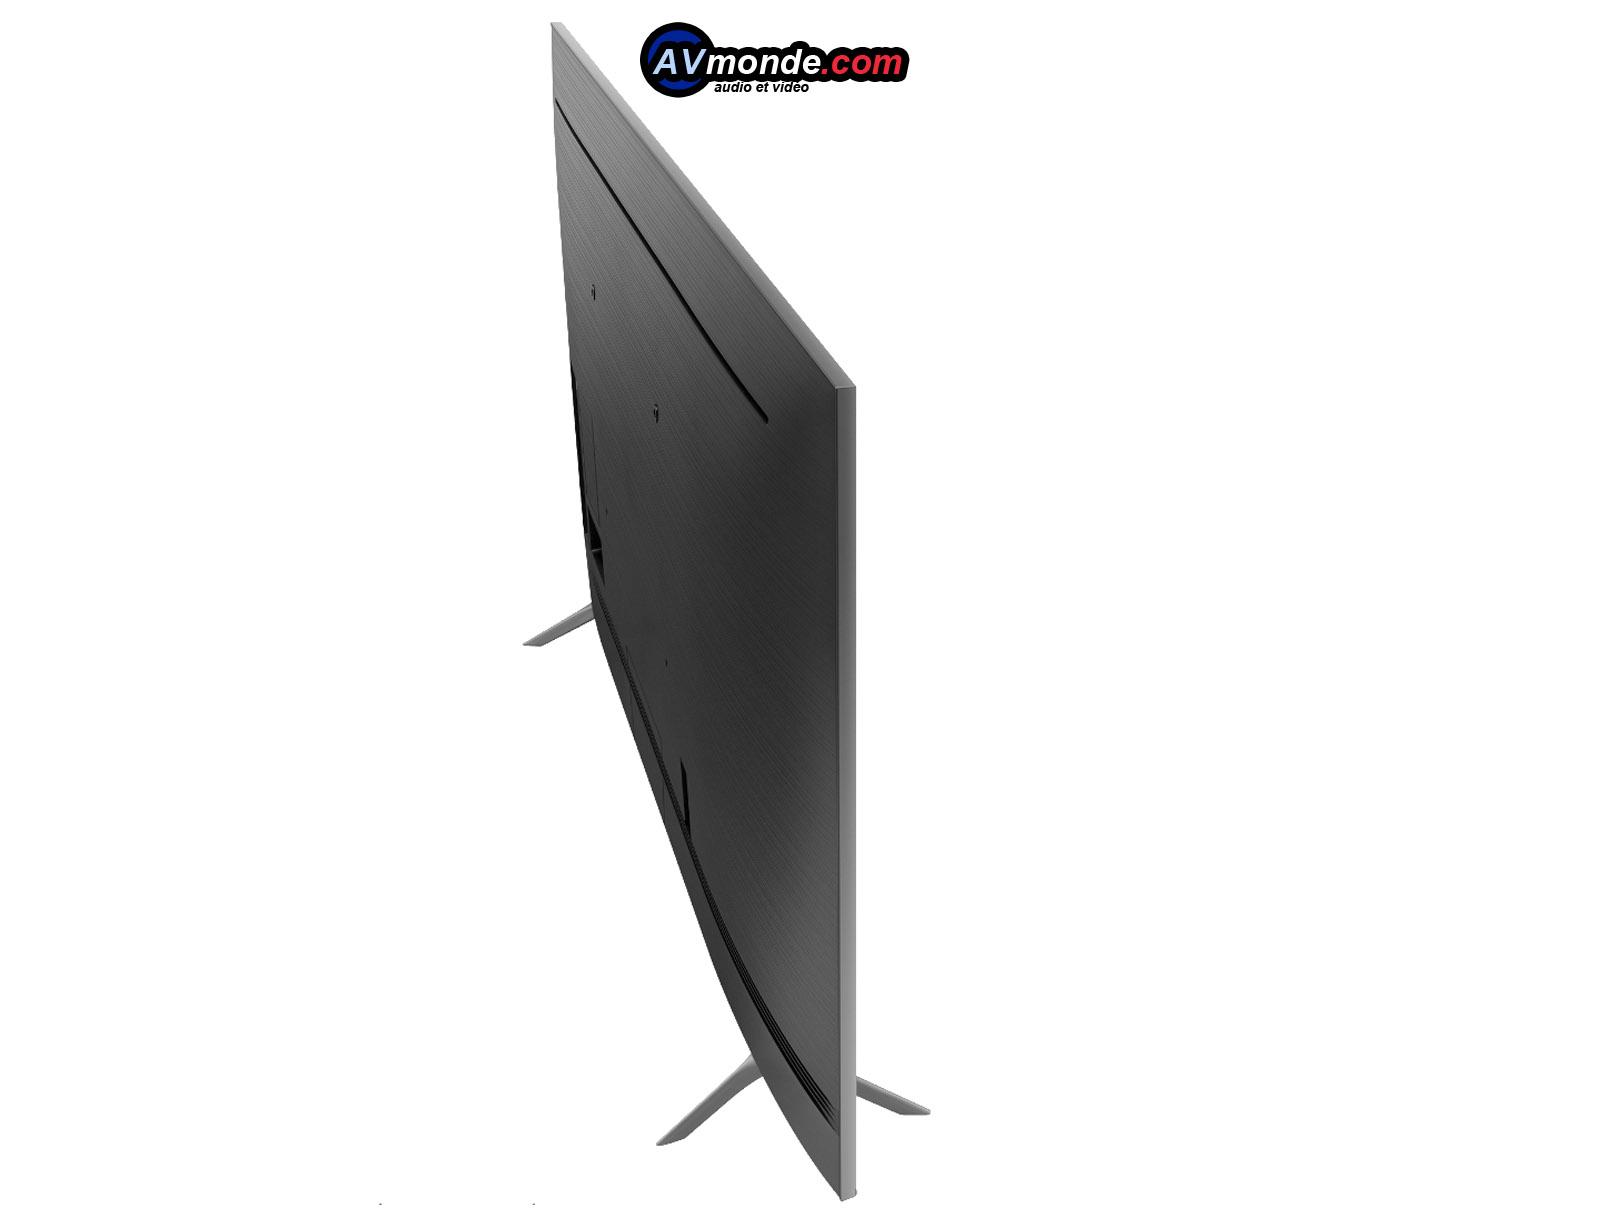 Samsung QE55Q70T QLED 4K TV